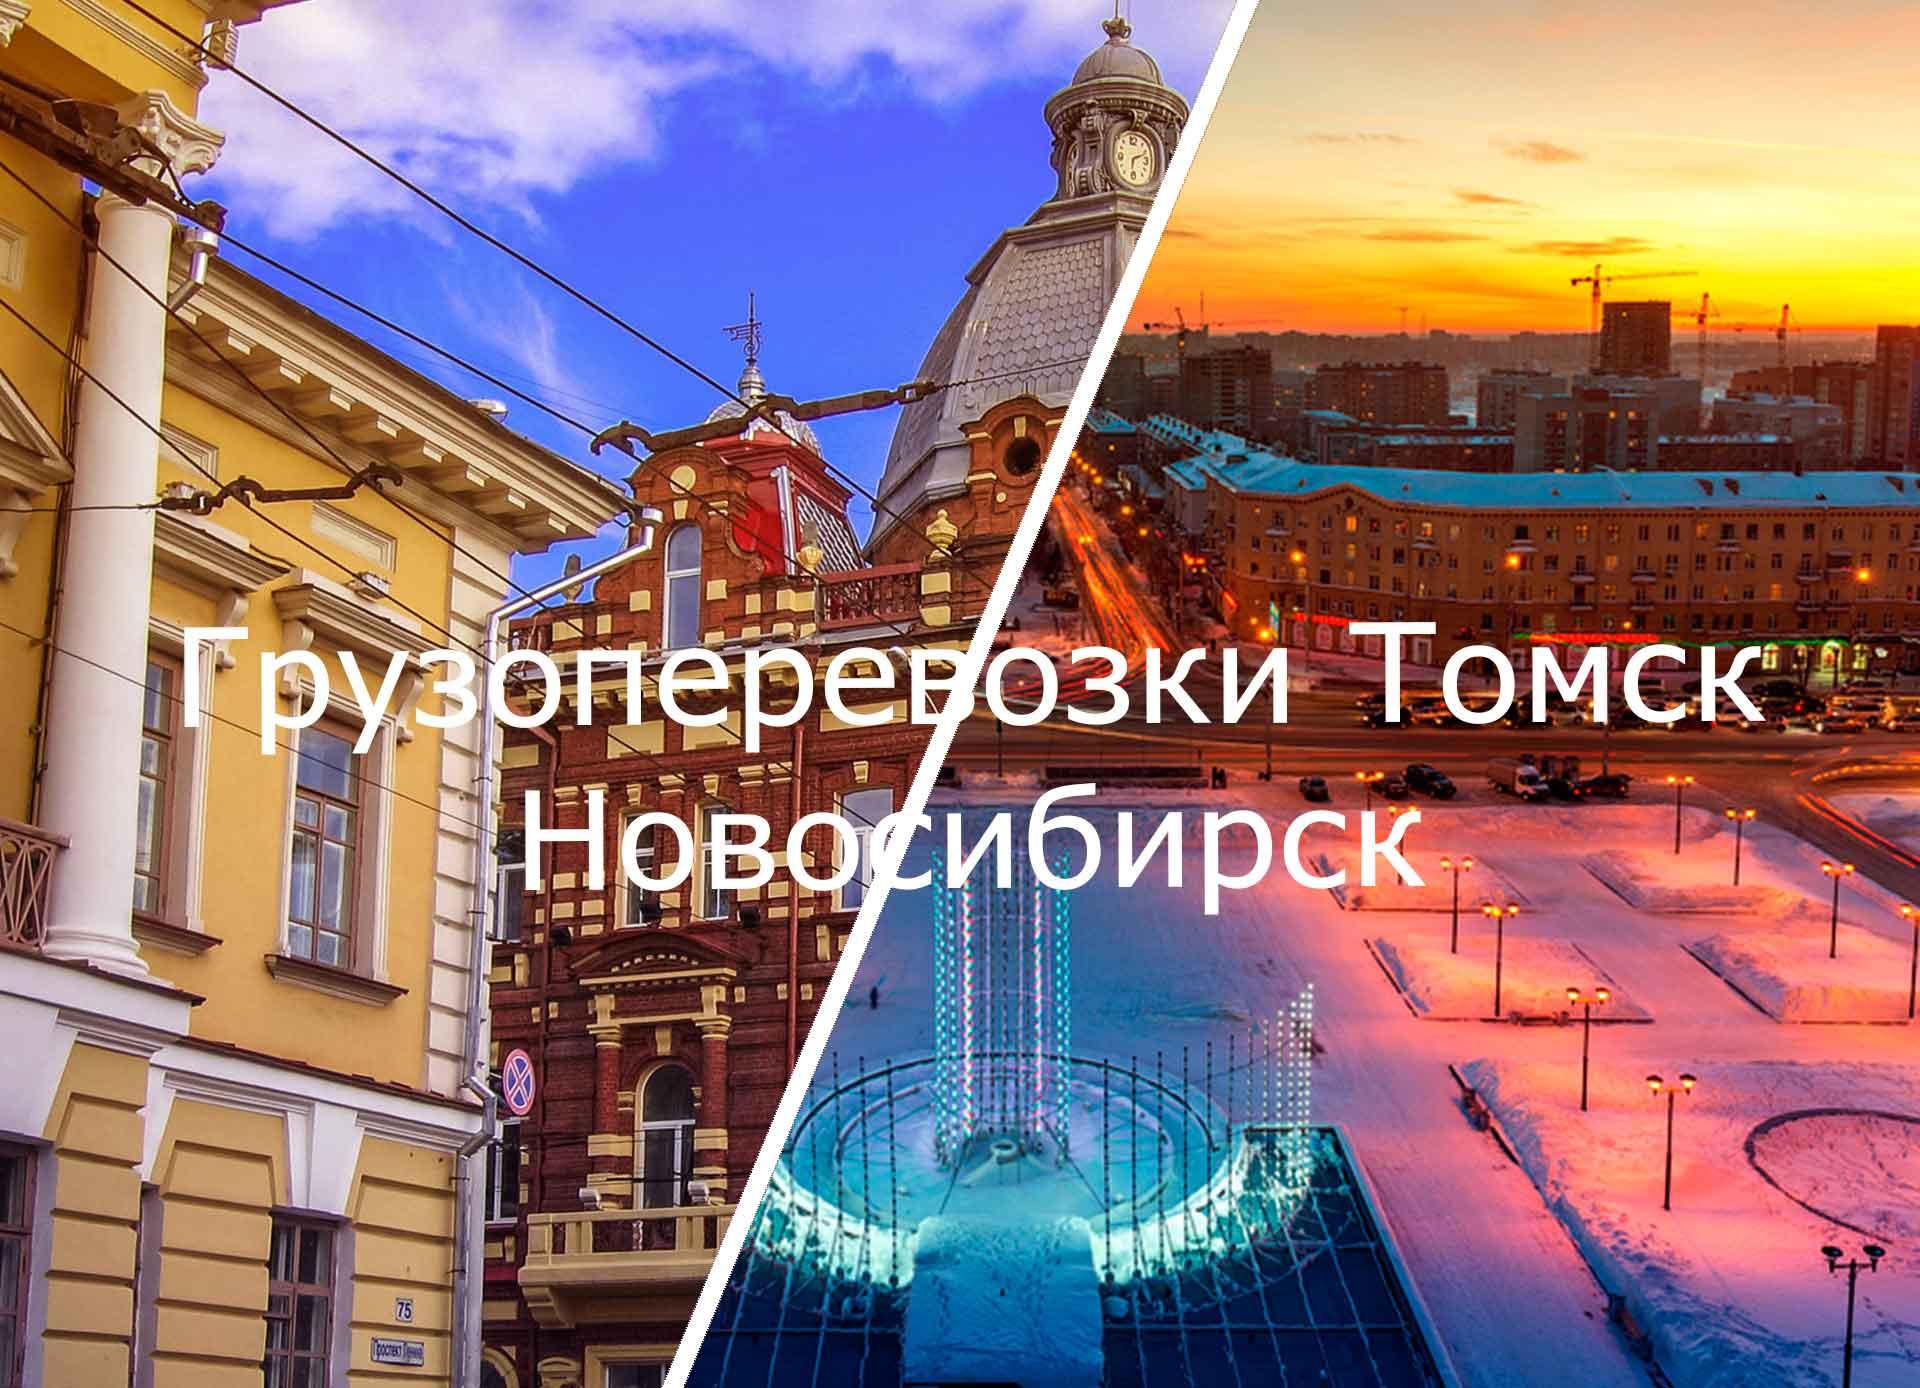 грузоперевозки томск новосибирск